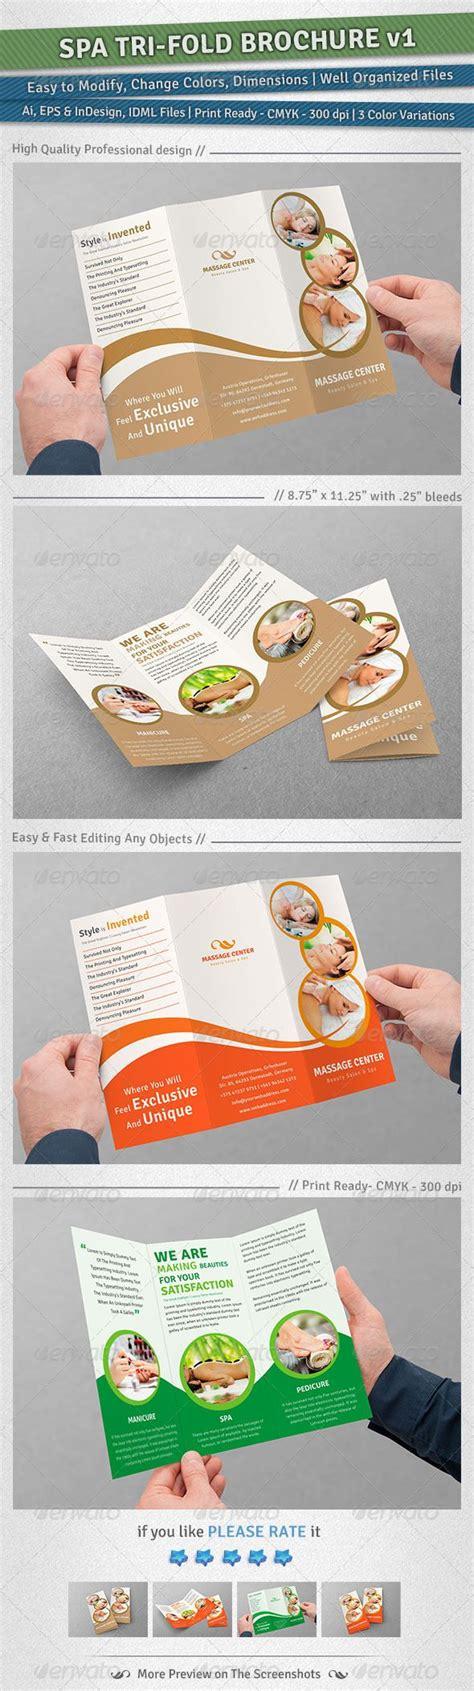 brochure templates for photoshop cs6 1000 ideas about tri fold brochure template on pinterest